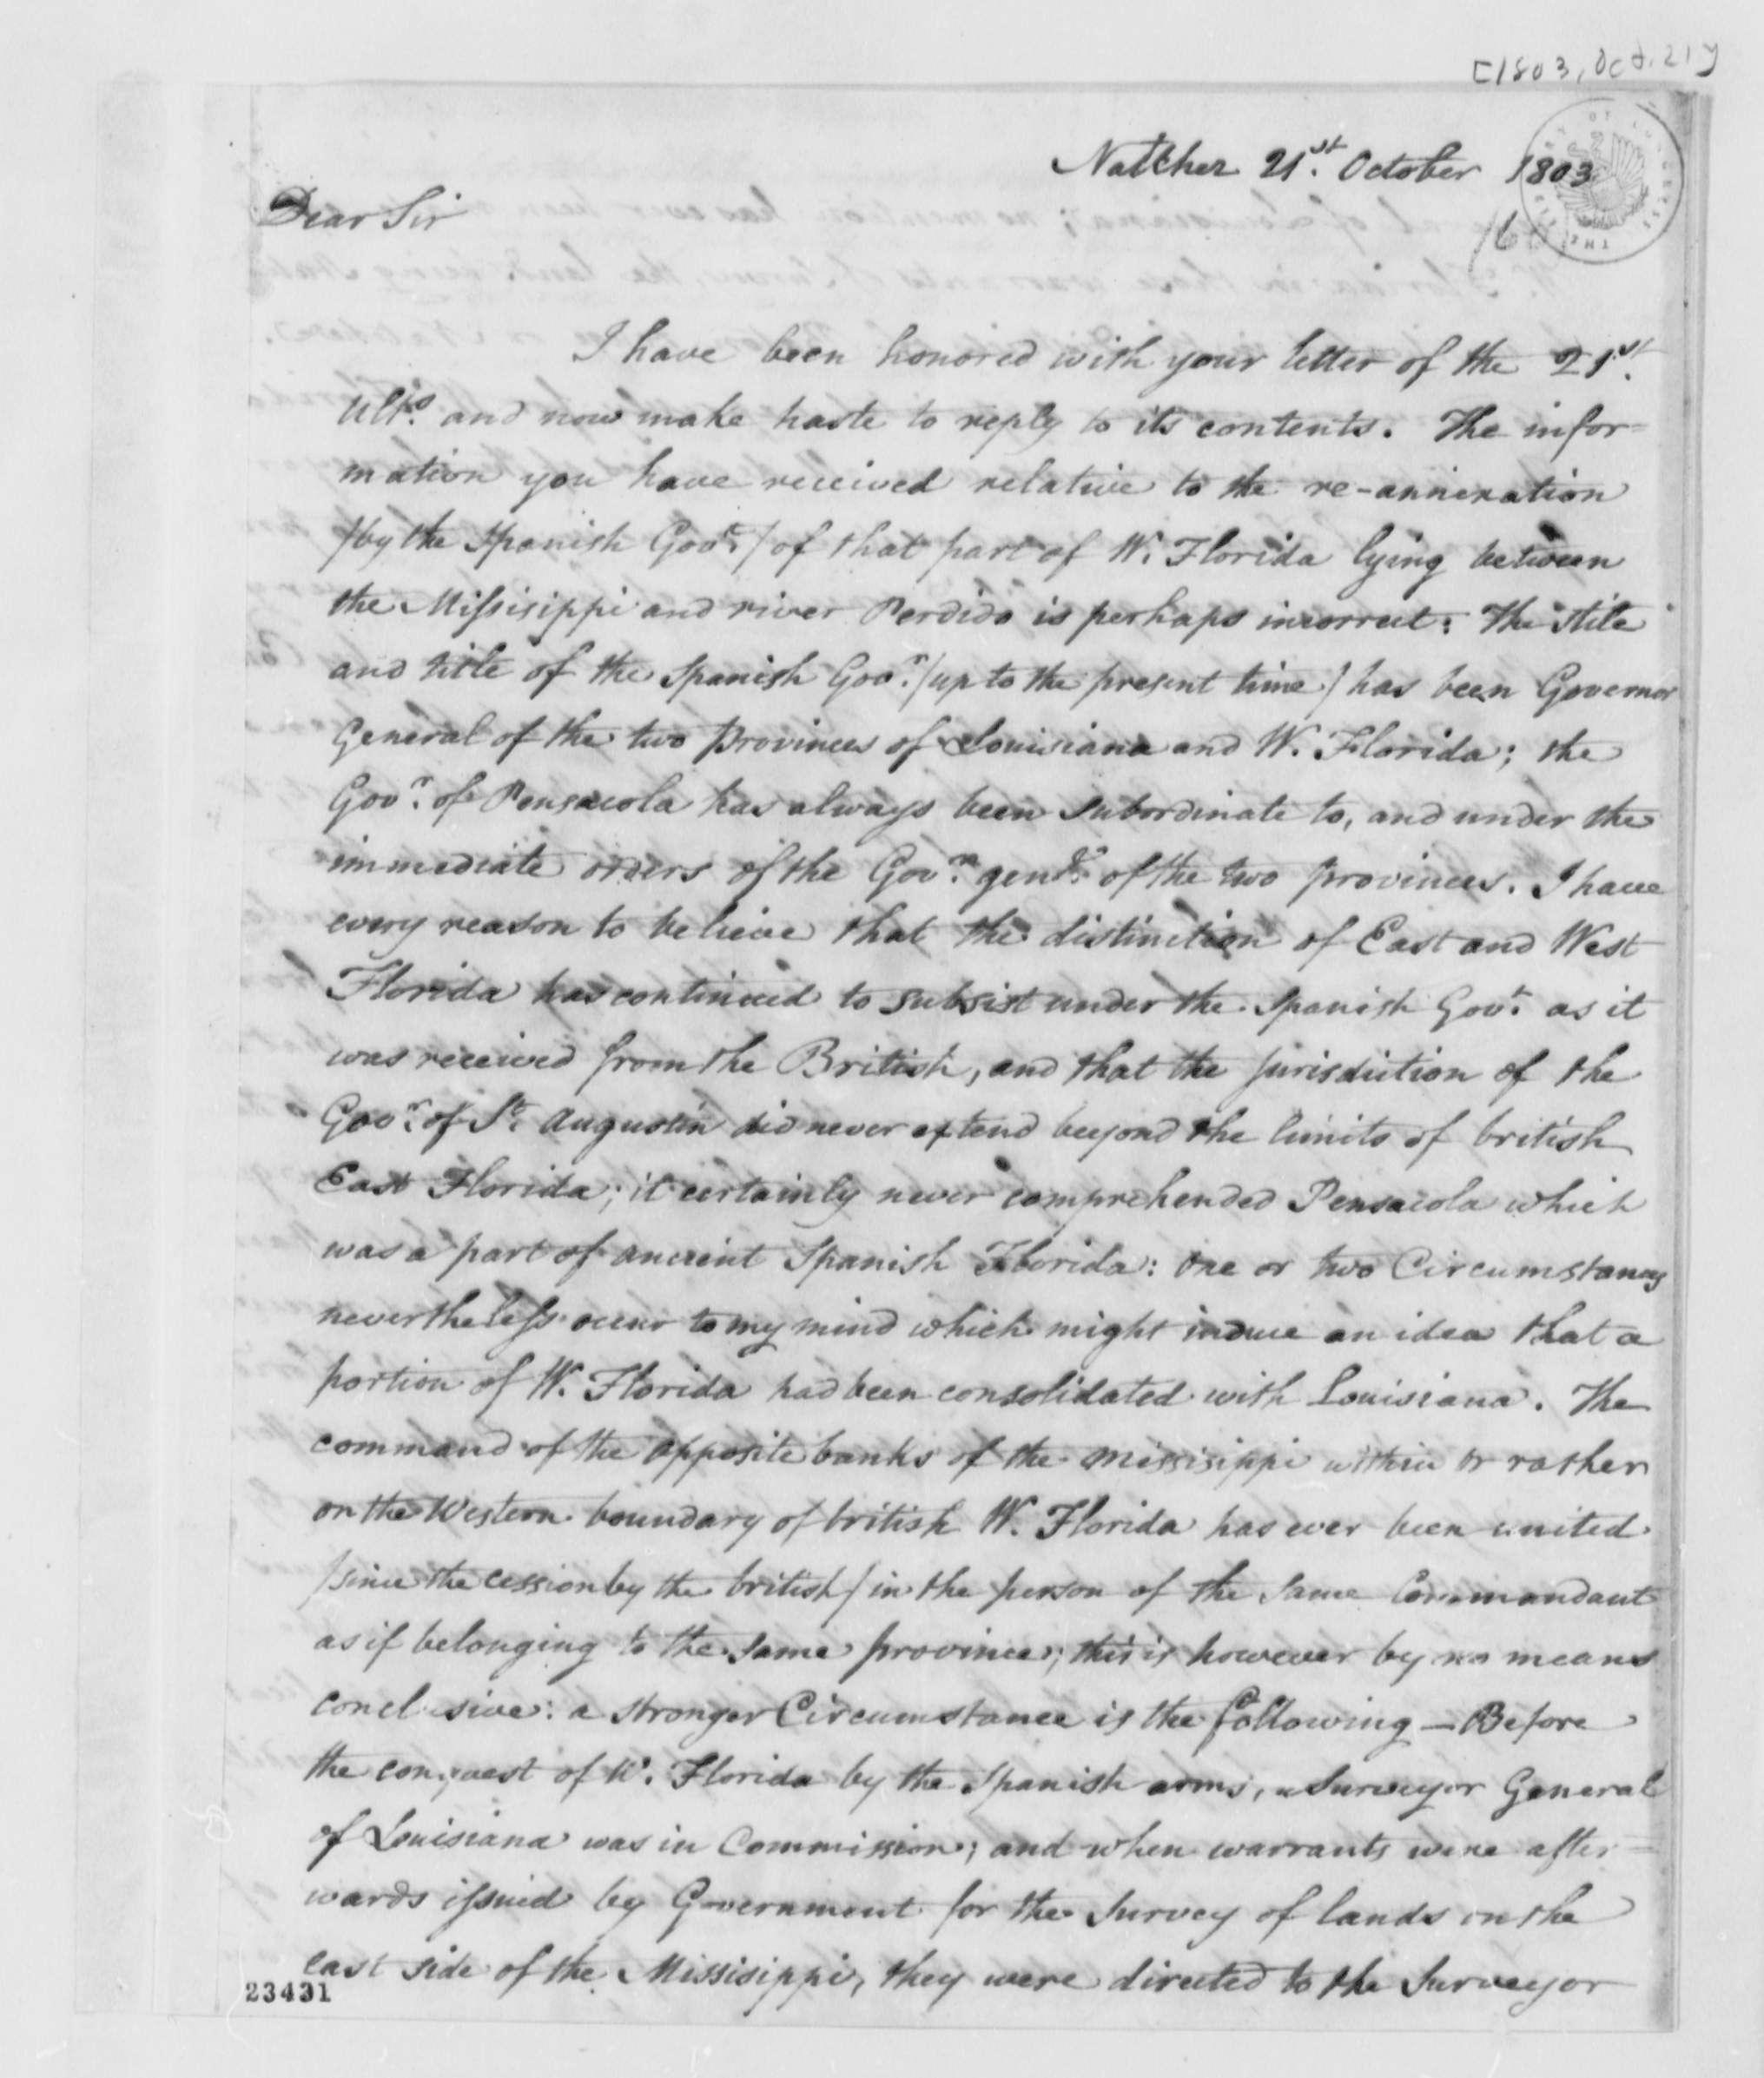 Prefect application letter ending